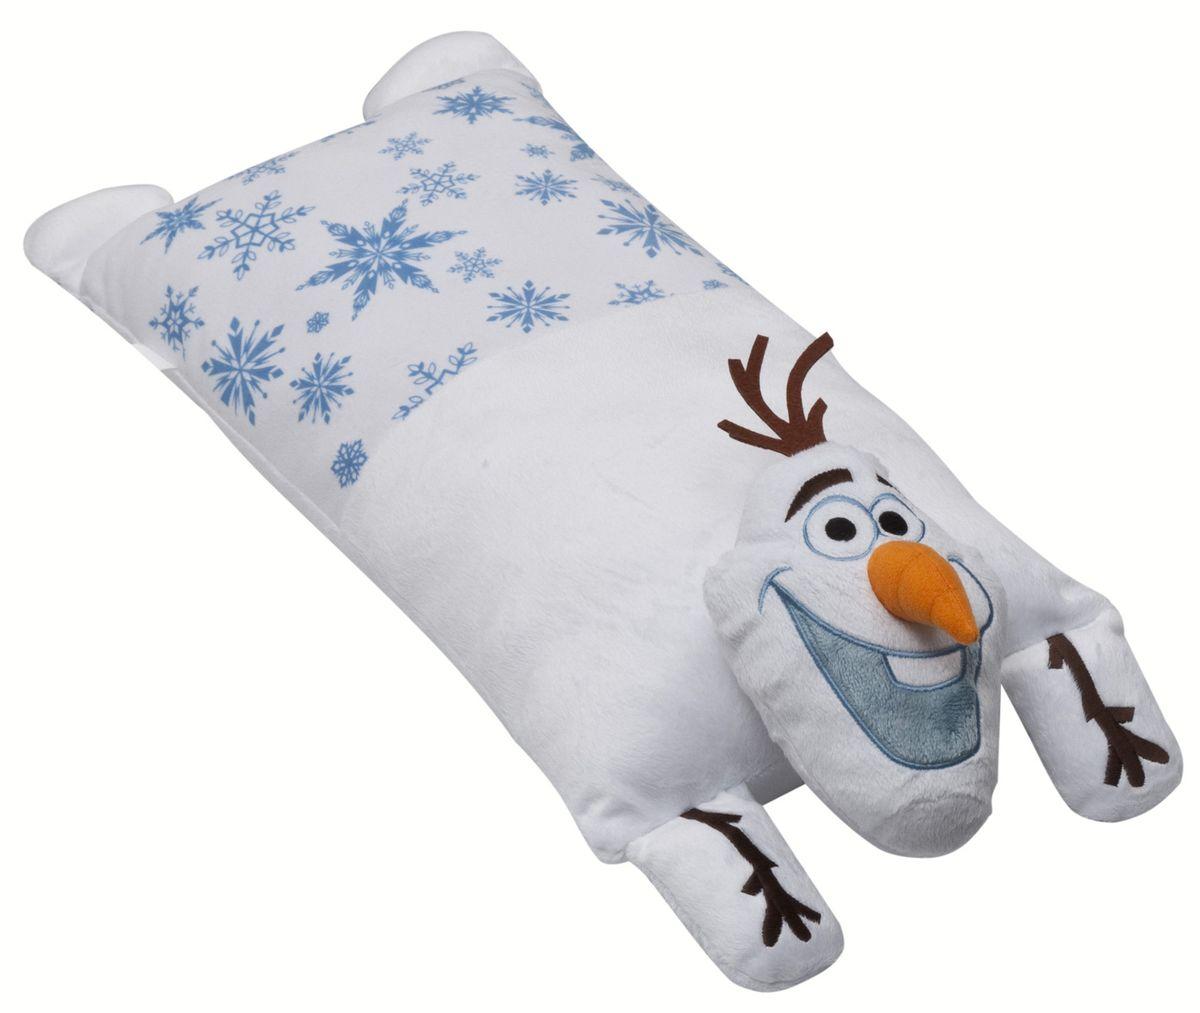 15640 Подушка Frozen (Холодное сердце)-Olaf, размер 50х25 см